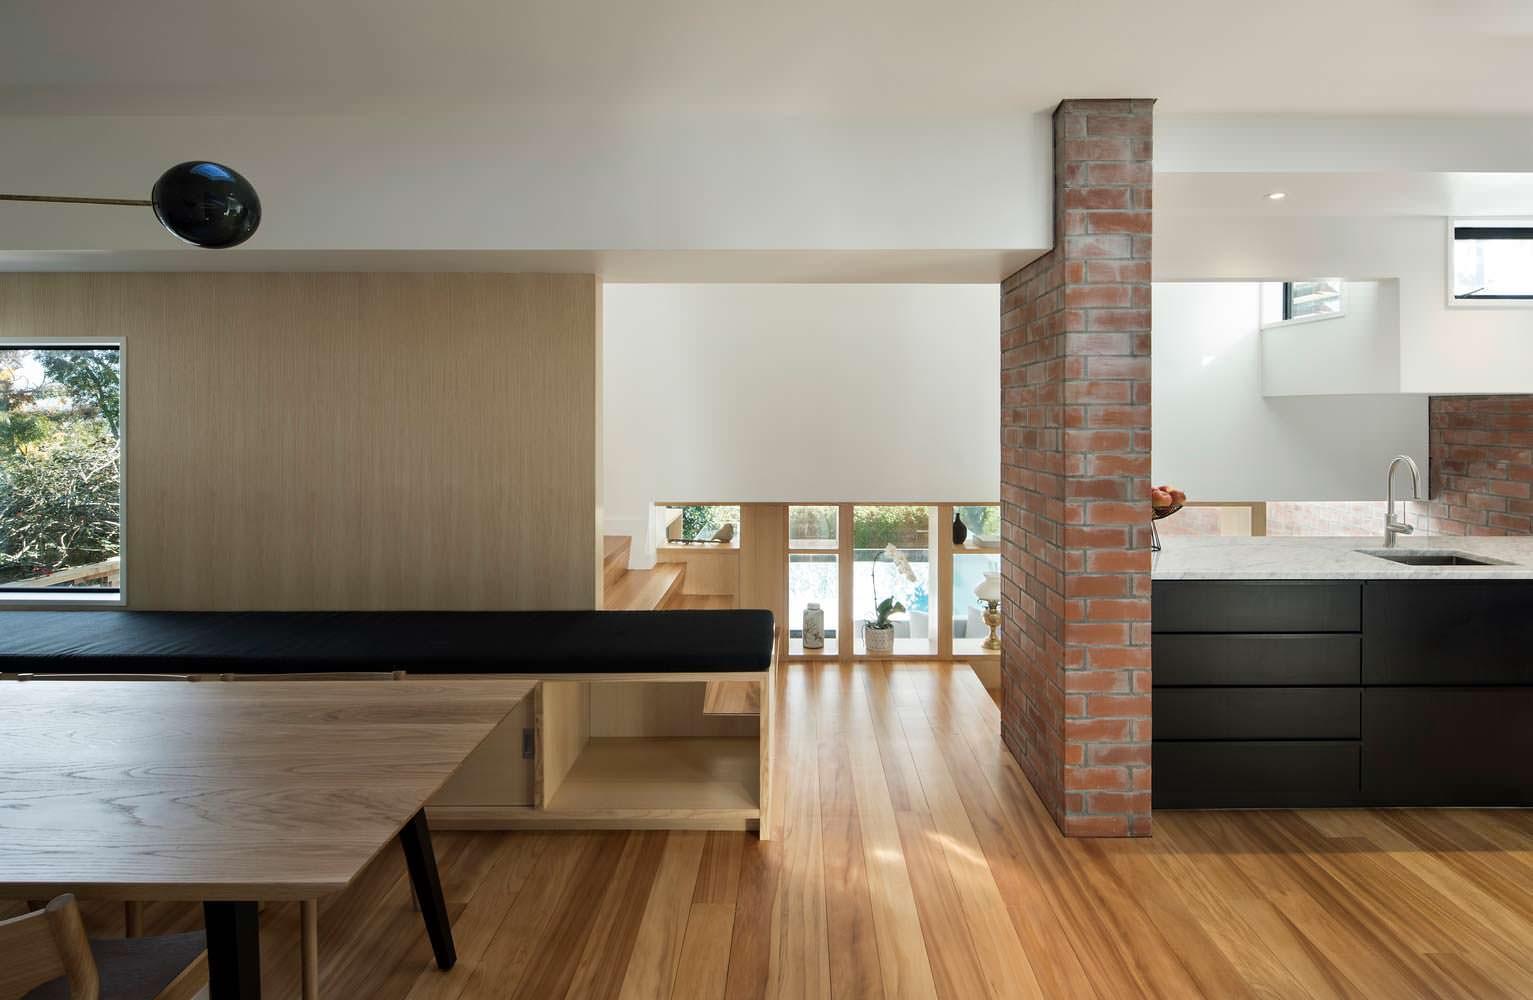 Дизайн кухни в стиле минимализм на втором этаже дома